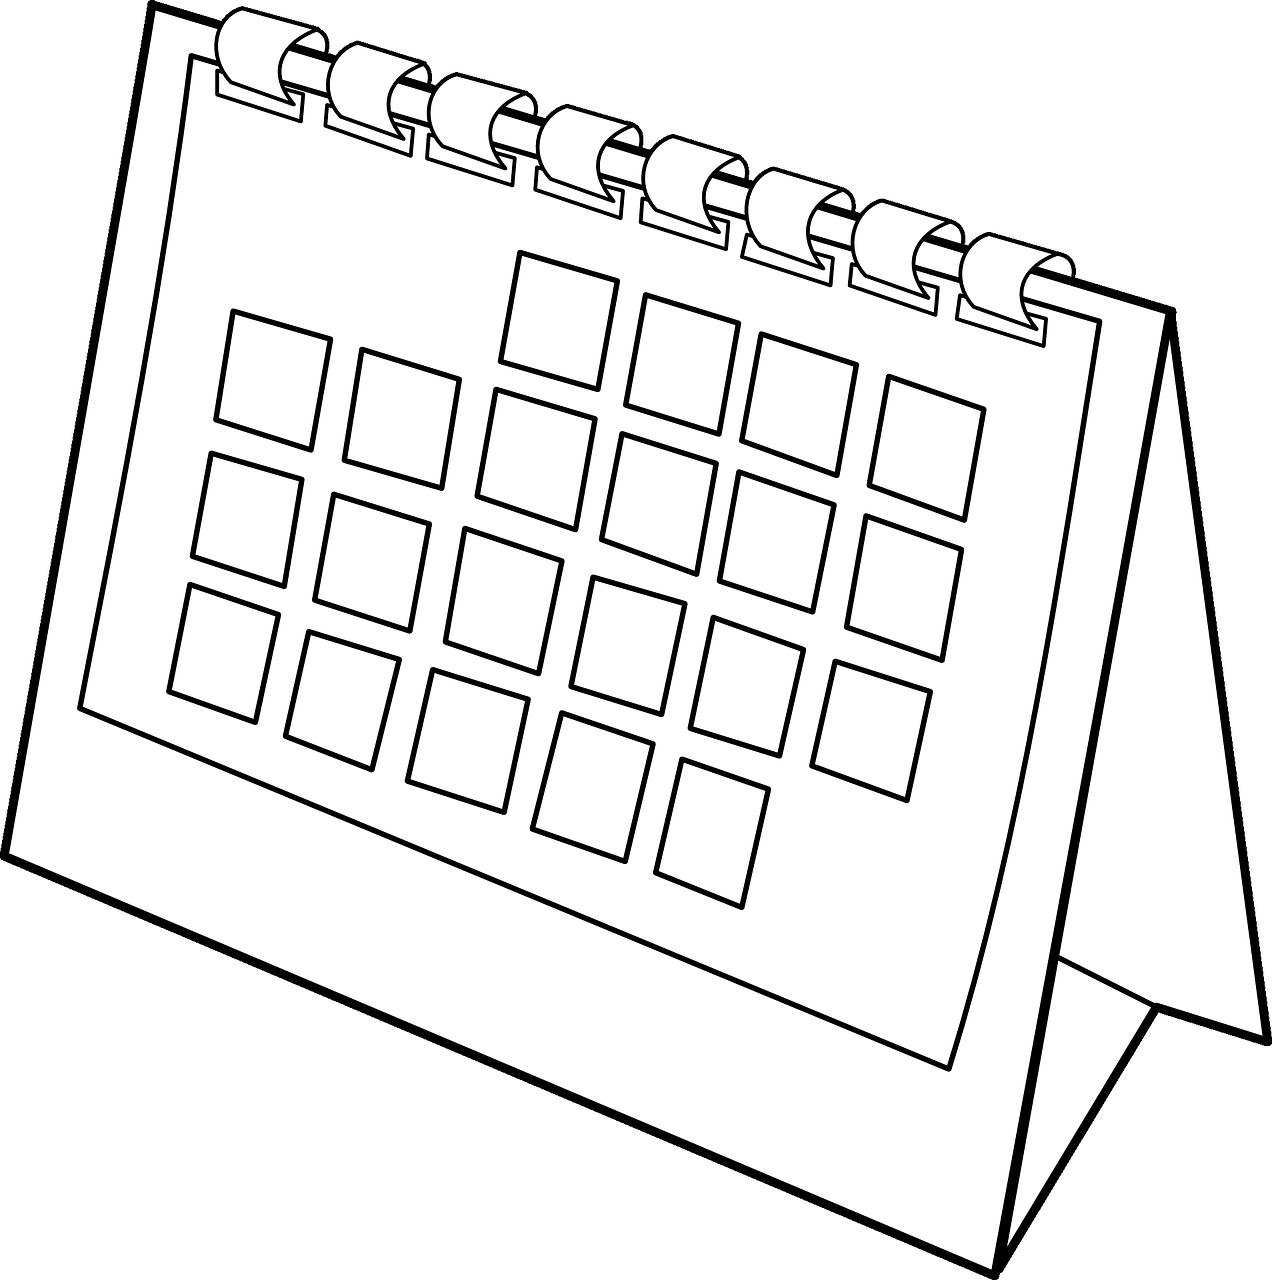 Square clipart bmp. Directory images clip art